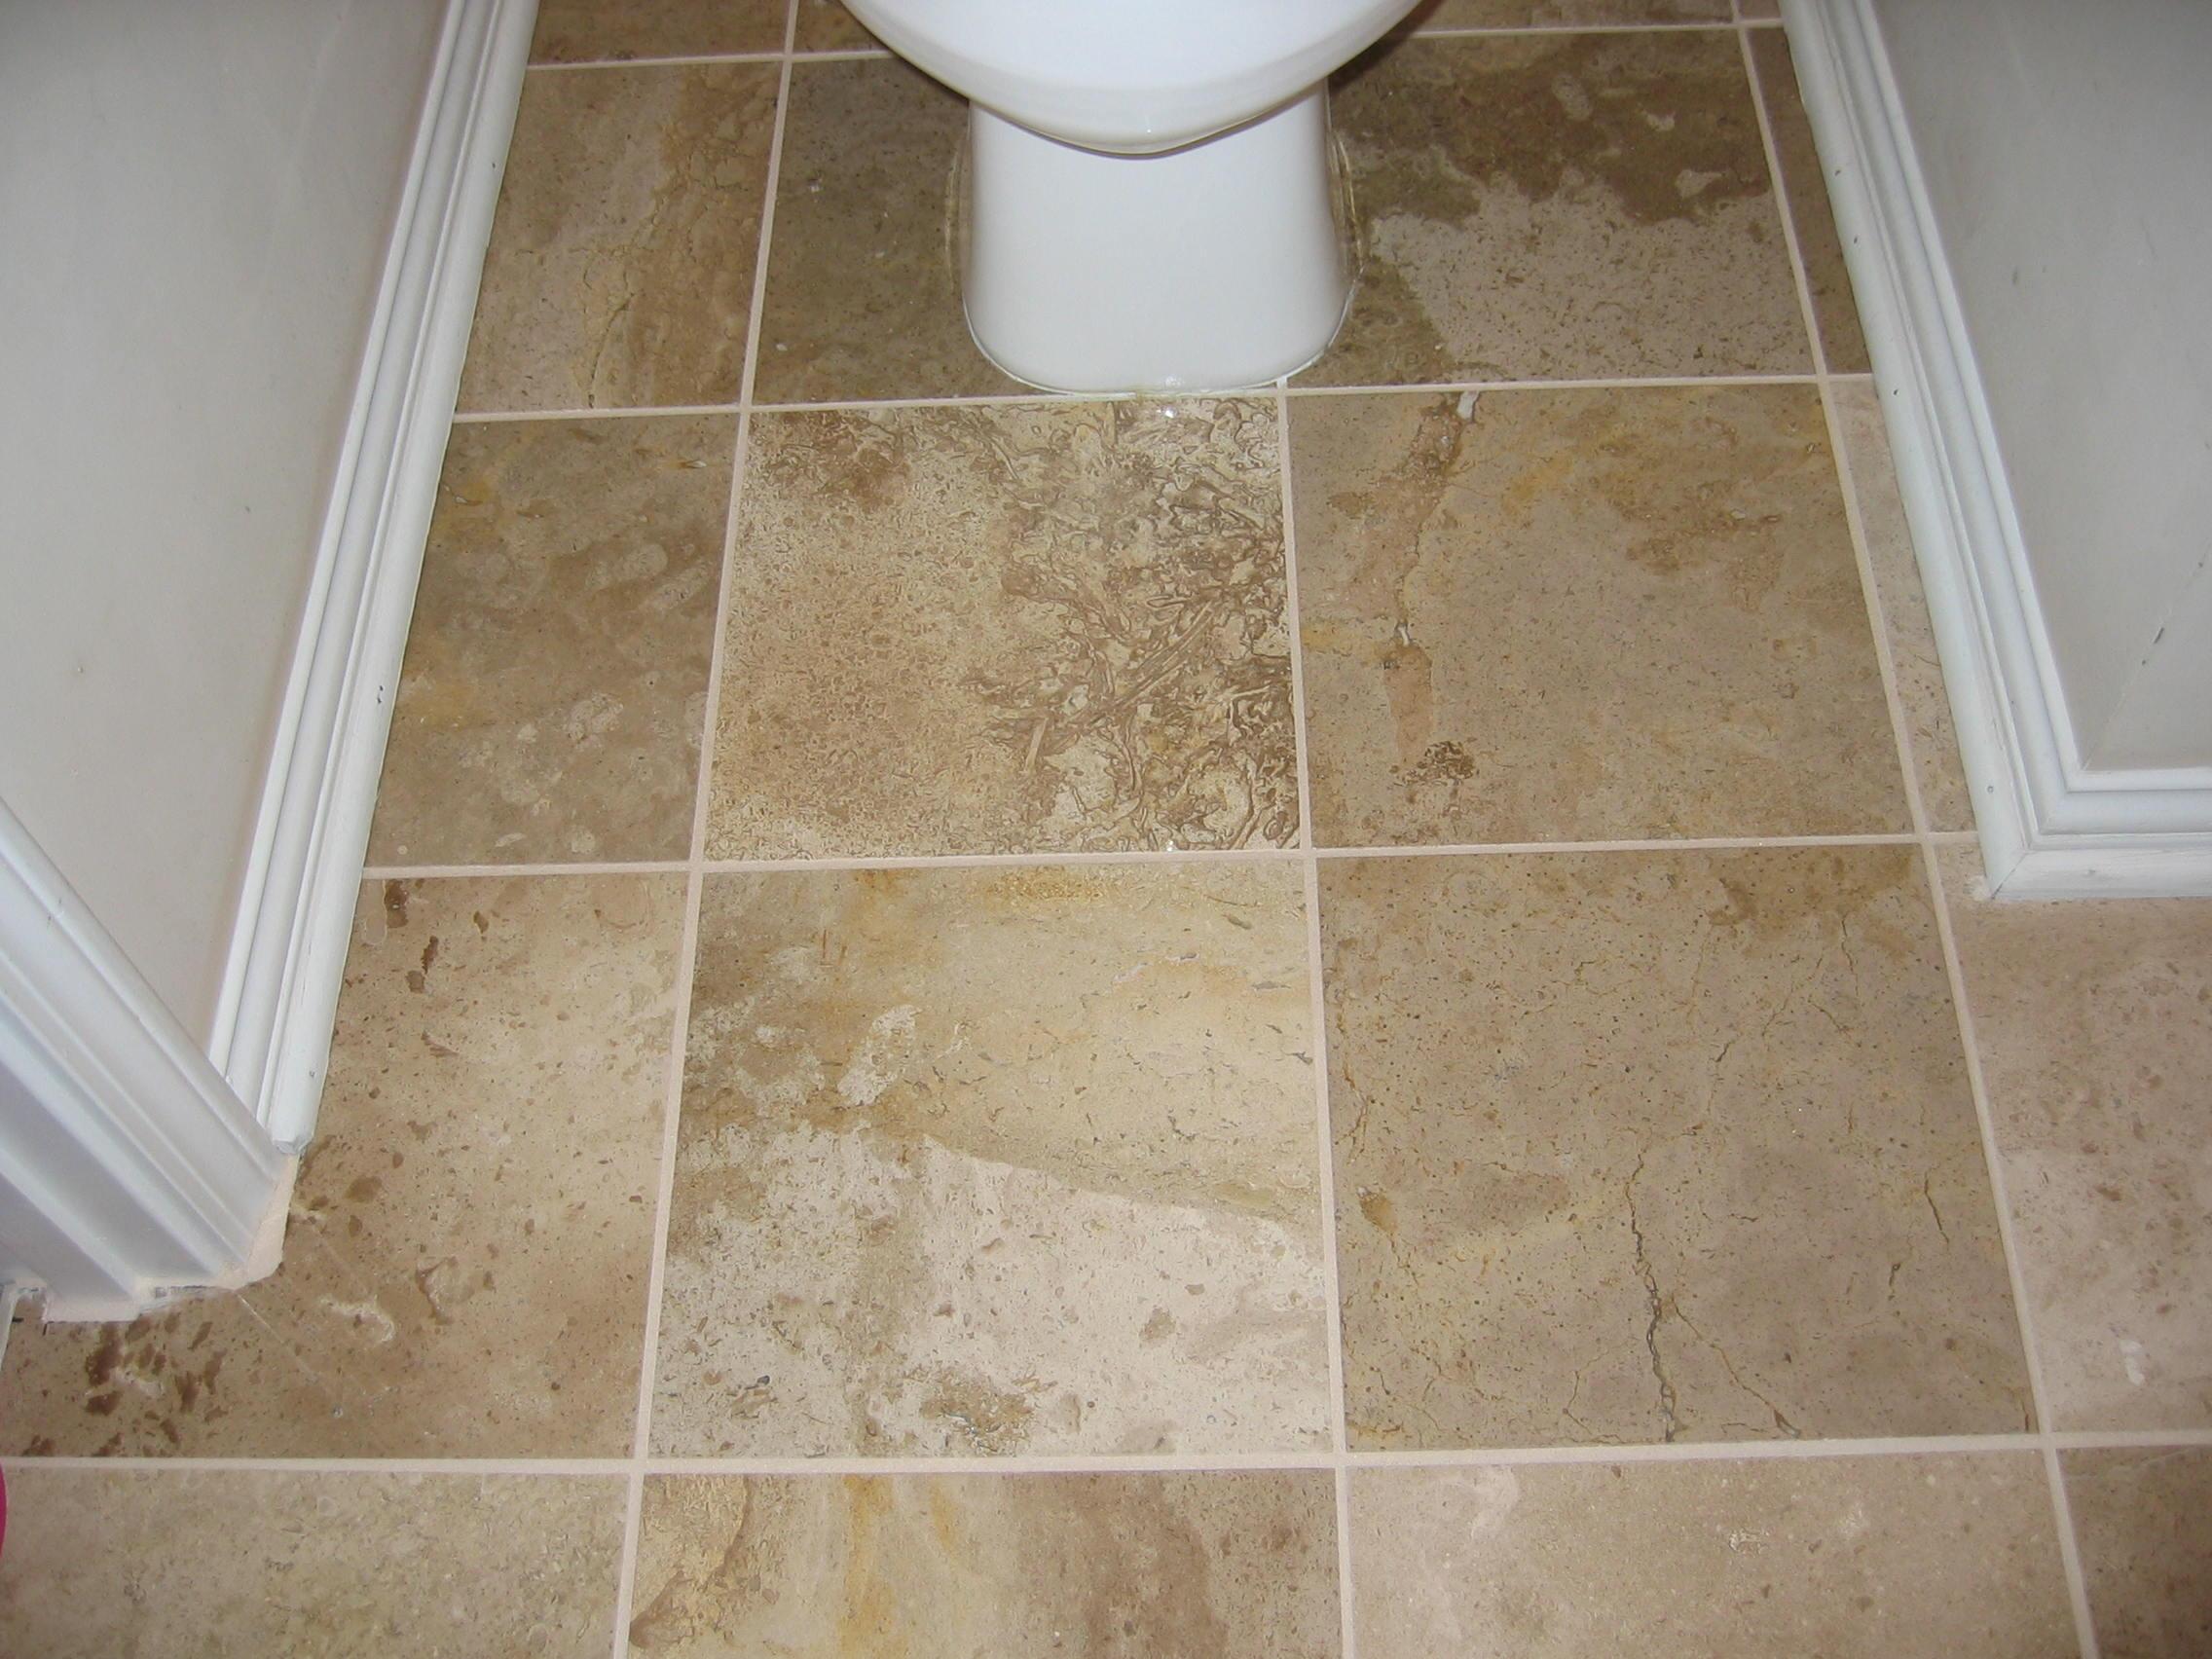 Travertine Tile Around Toilet Jpg